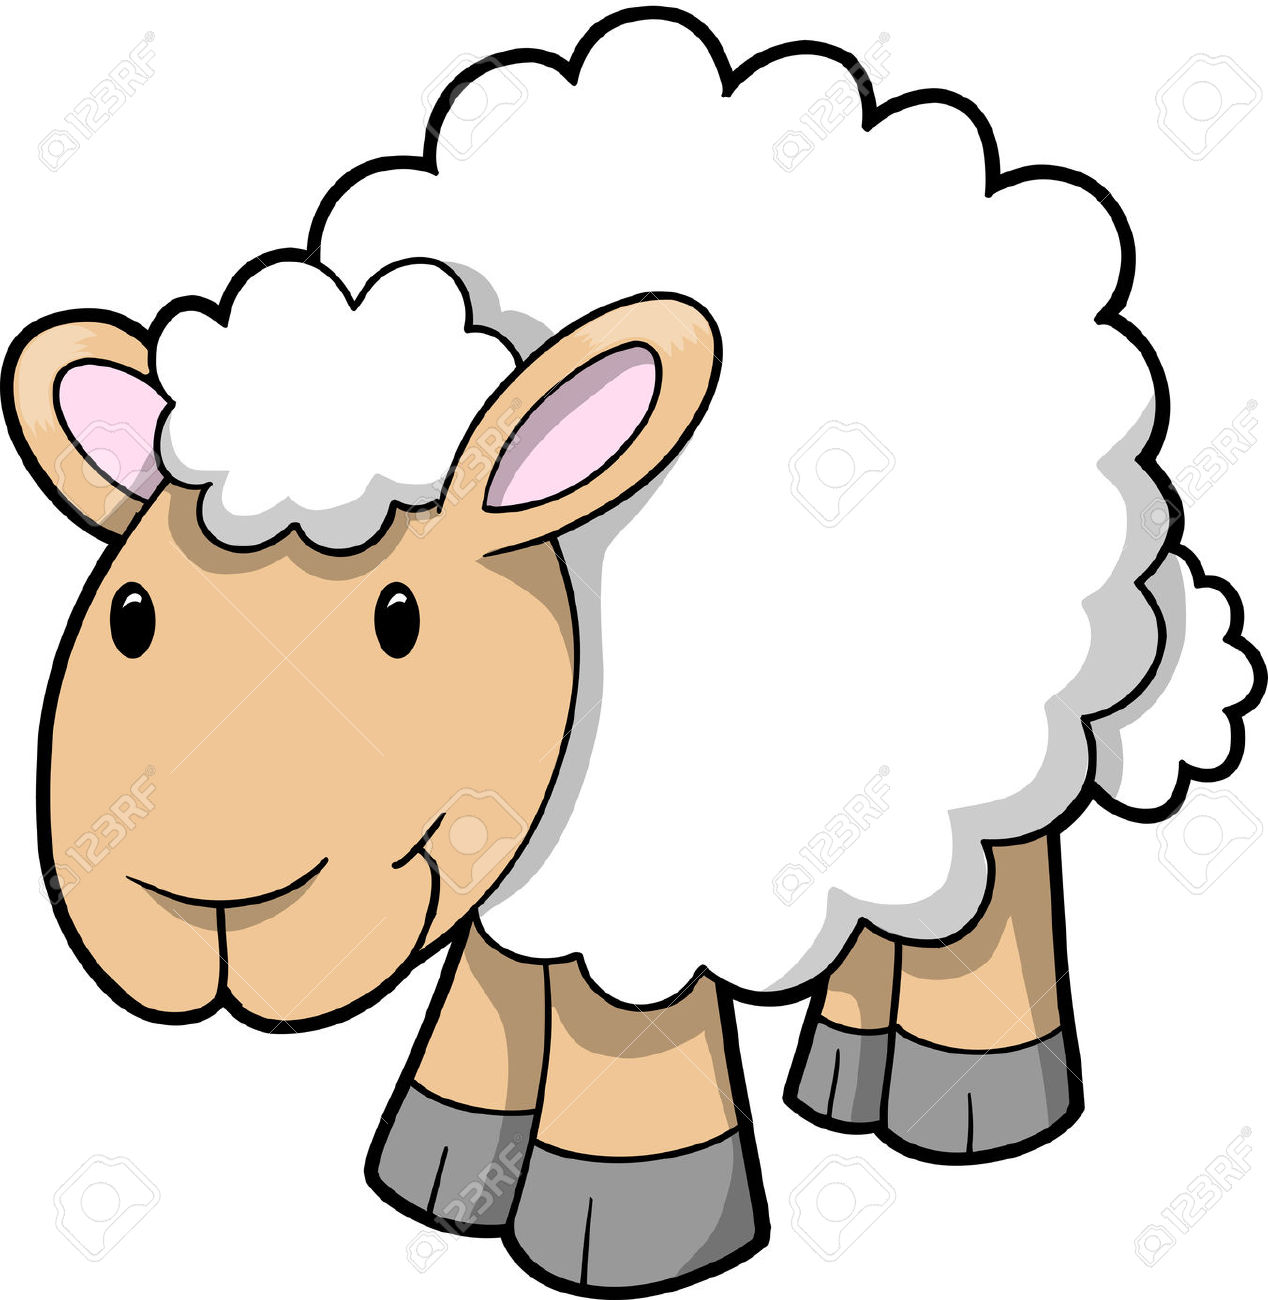 Pin Sheep Clipart Cartoon #1 - PNG Sheep Cartoon